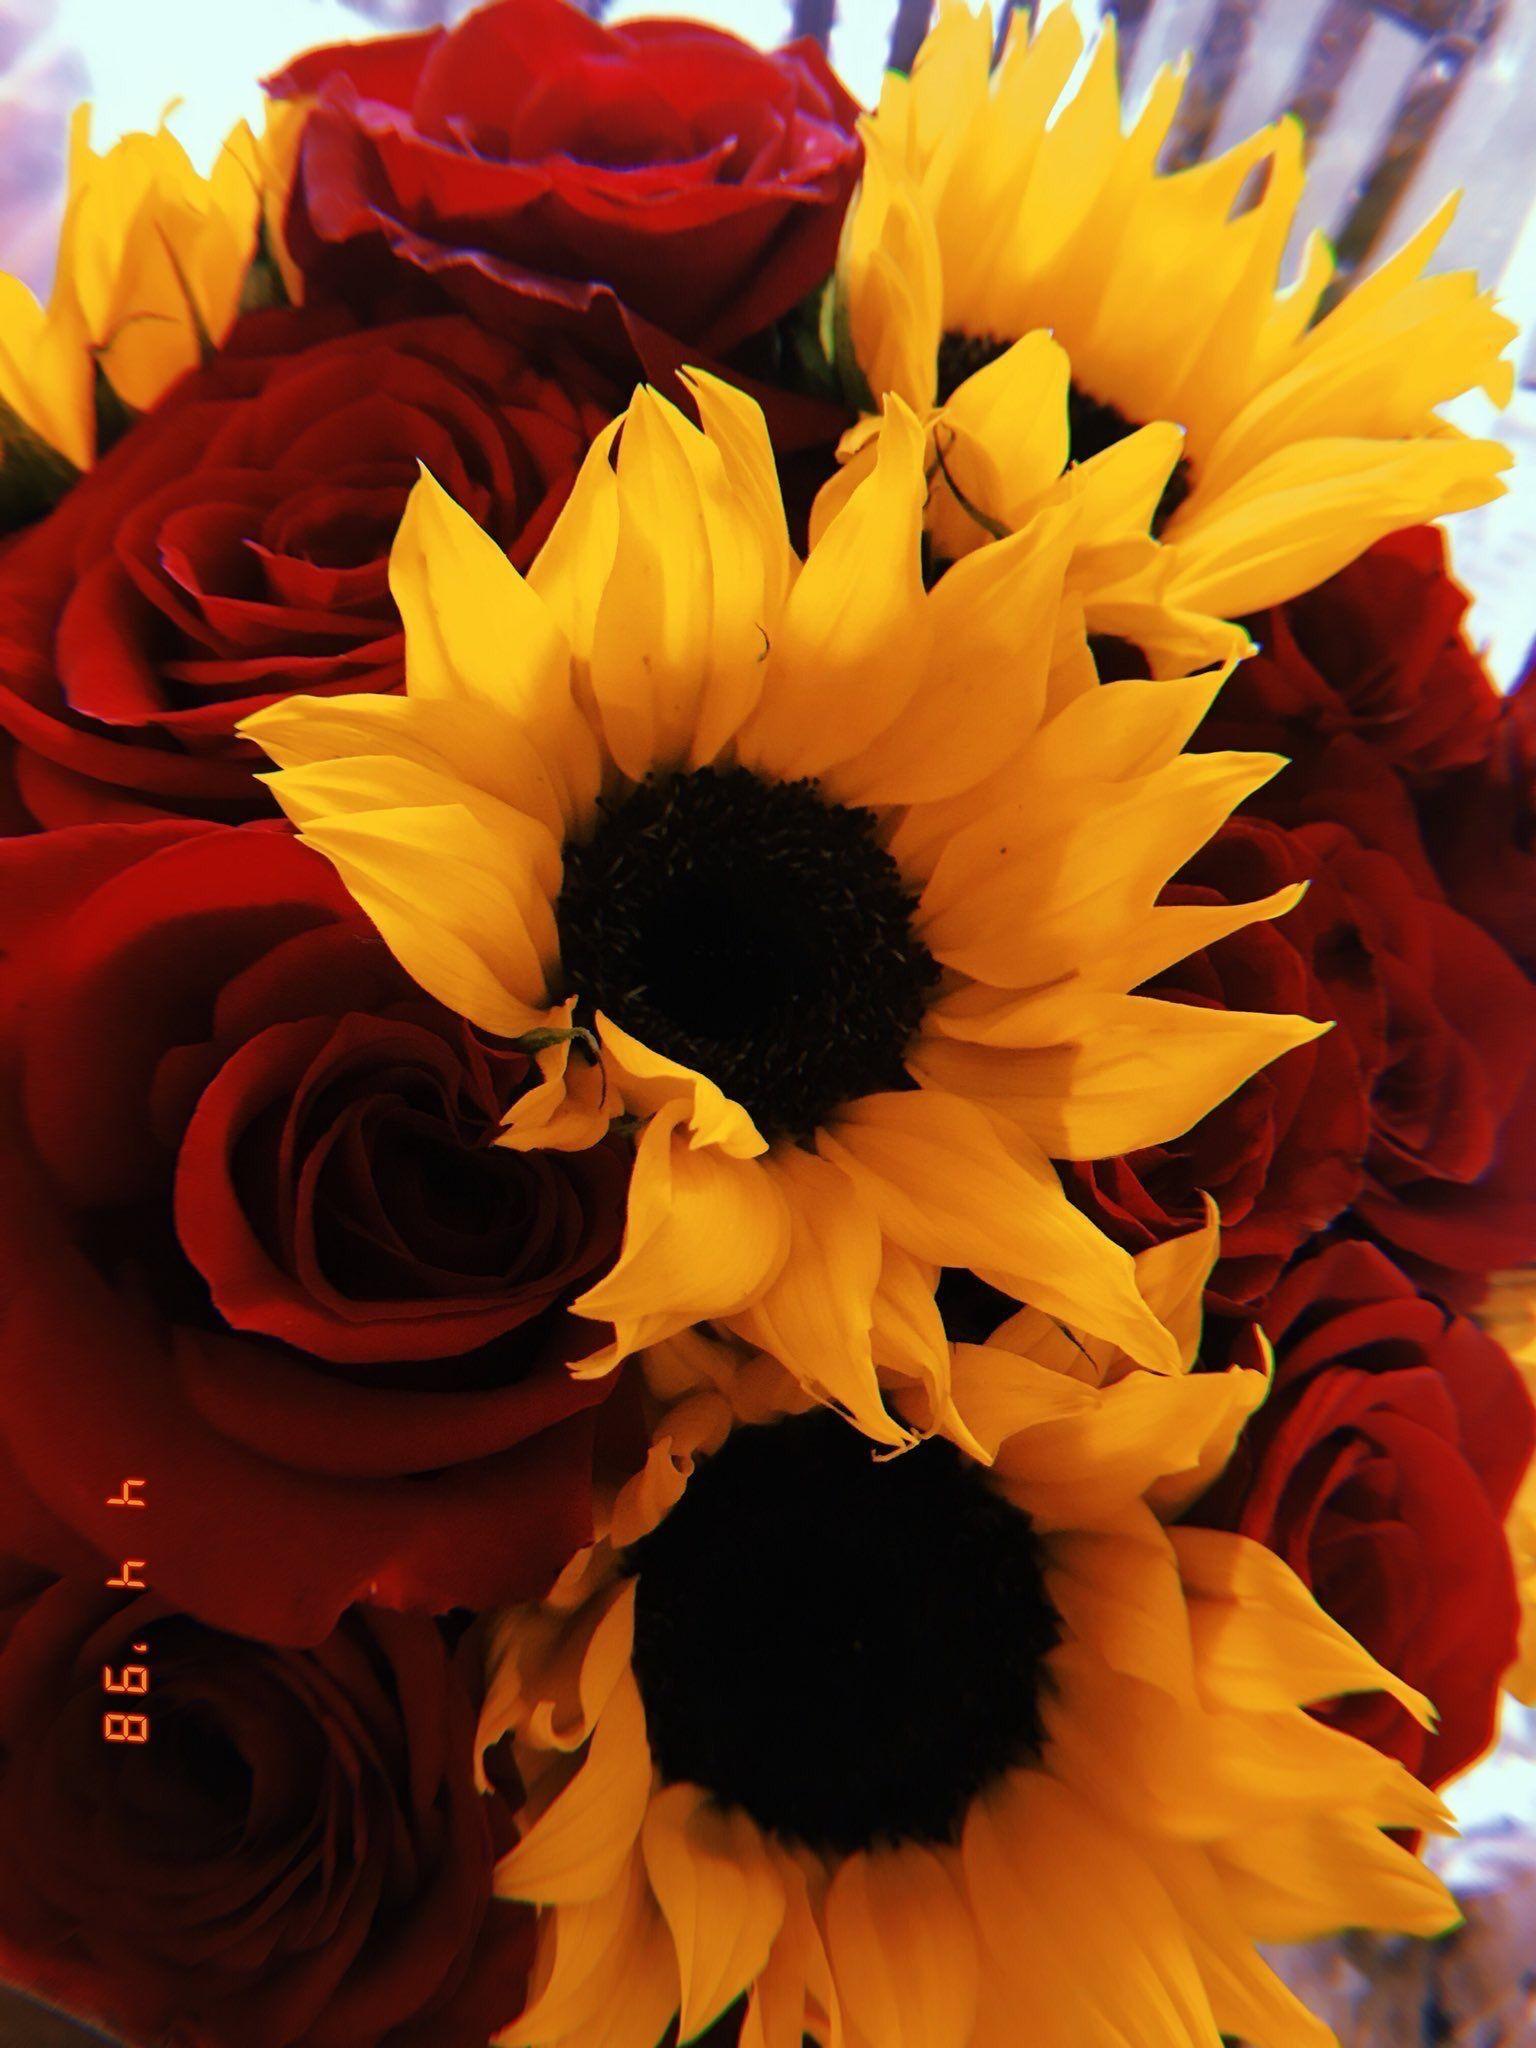 Sunflowers And Roses Sunflowers And Roses Sunflowers Background Sunflower Wallpaper